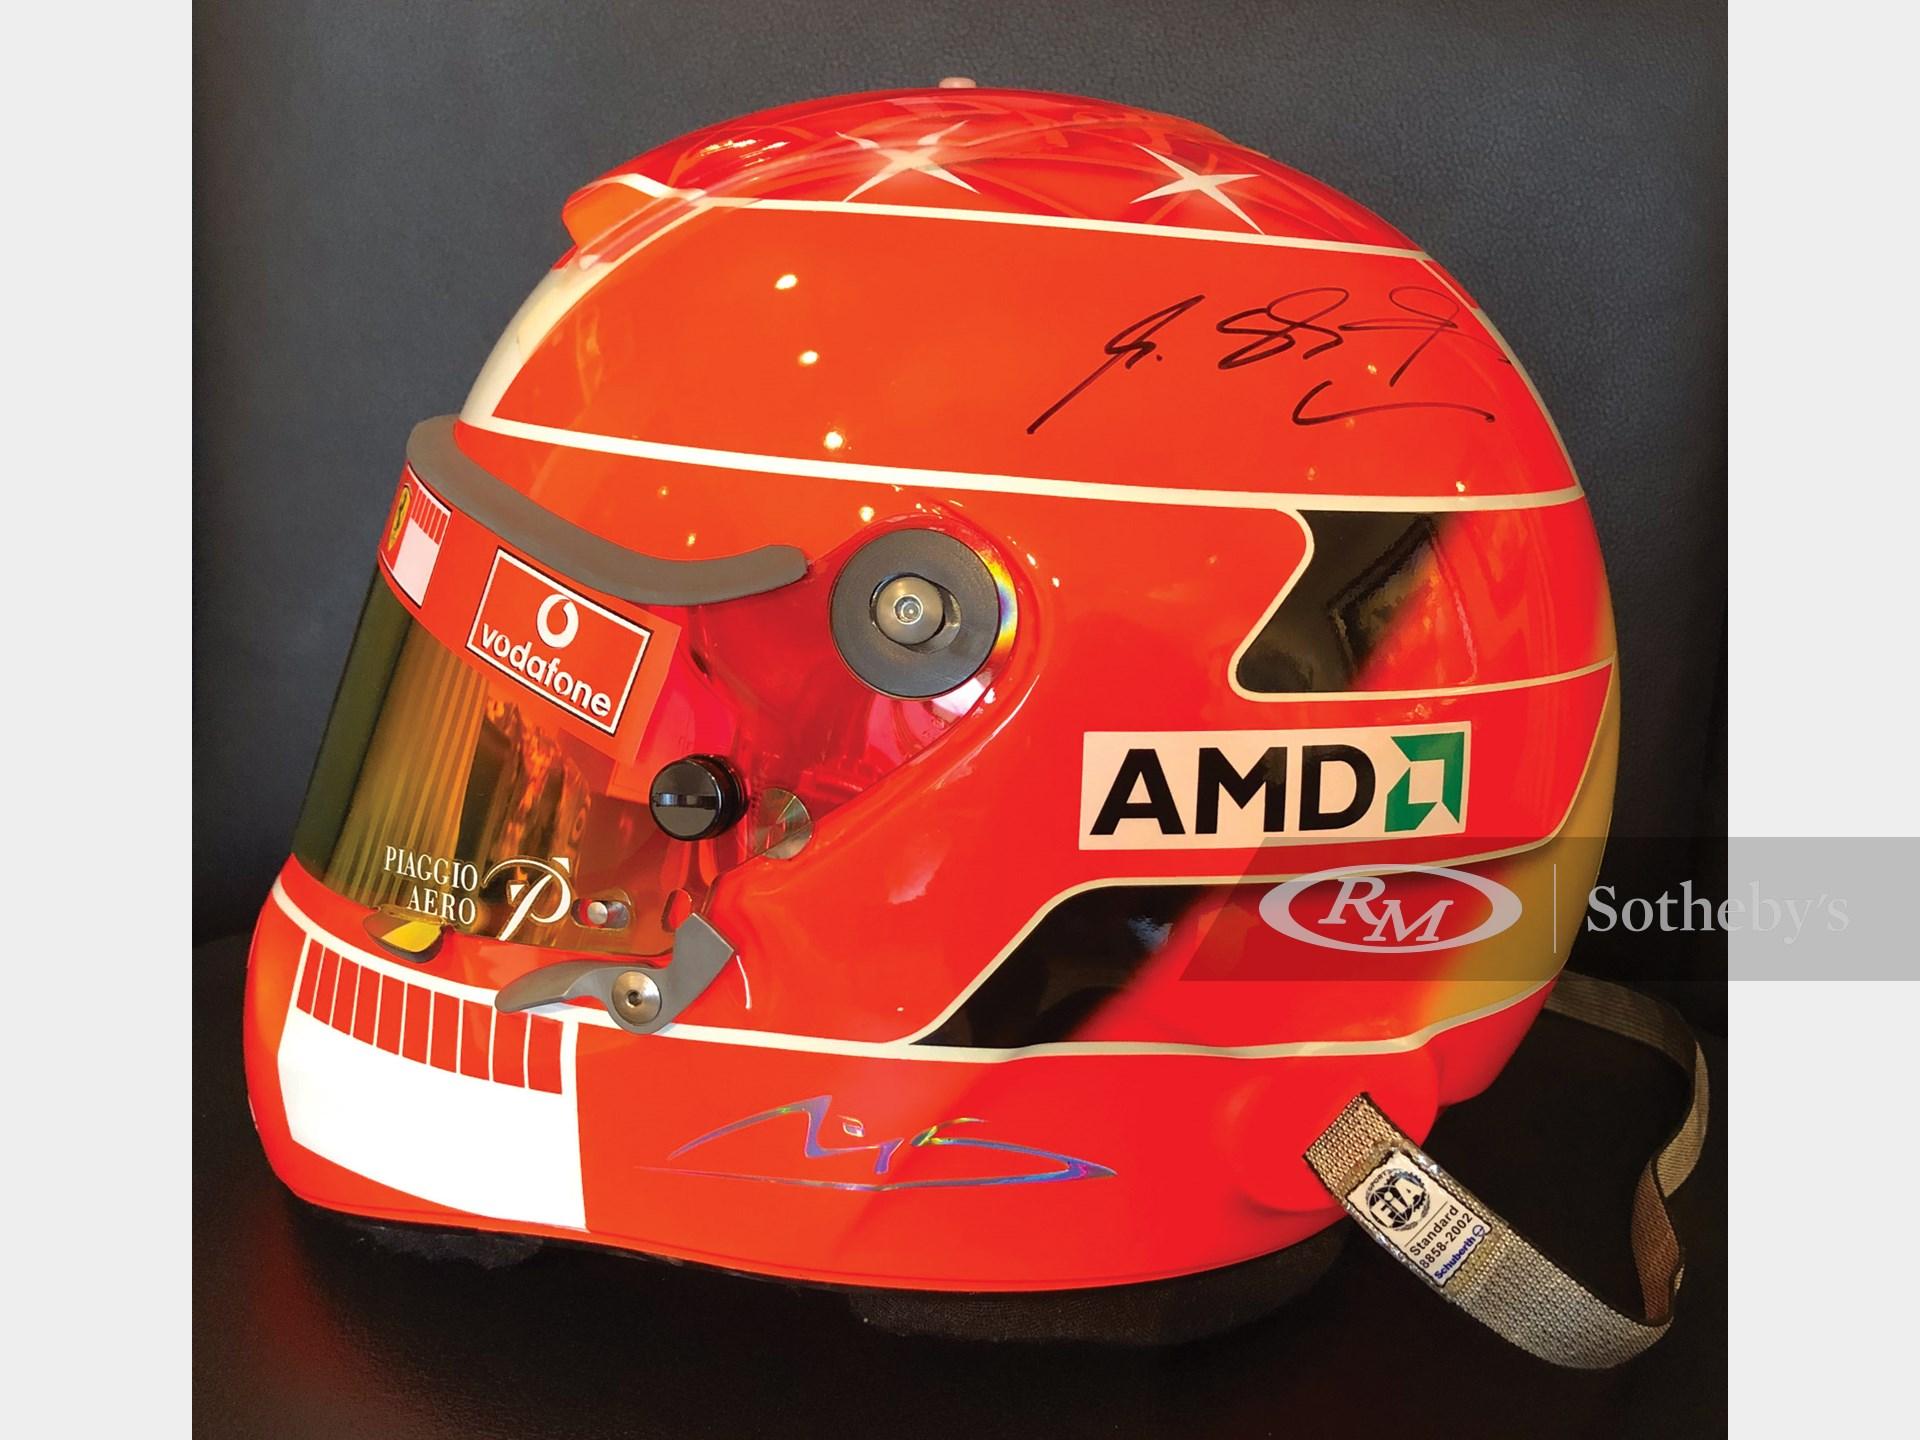 Michael Schumacher Ferrari Formula 1 Helmet, 2005 -